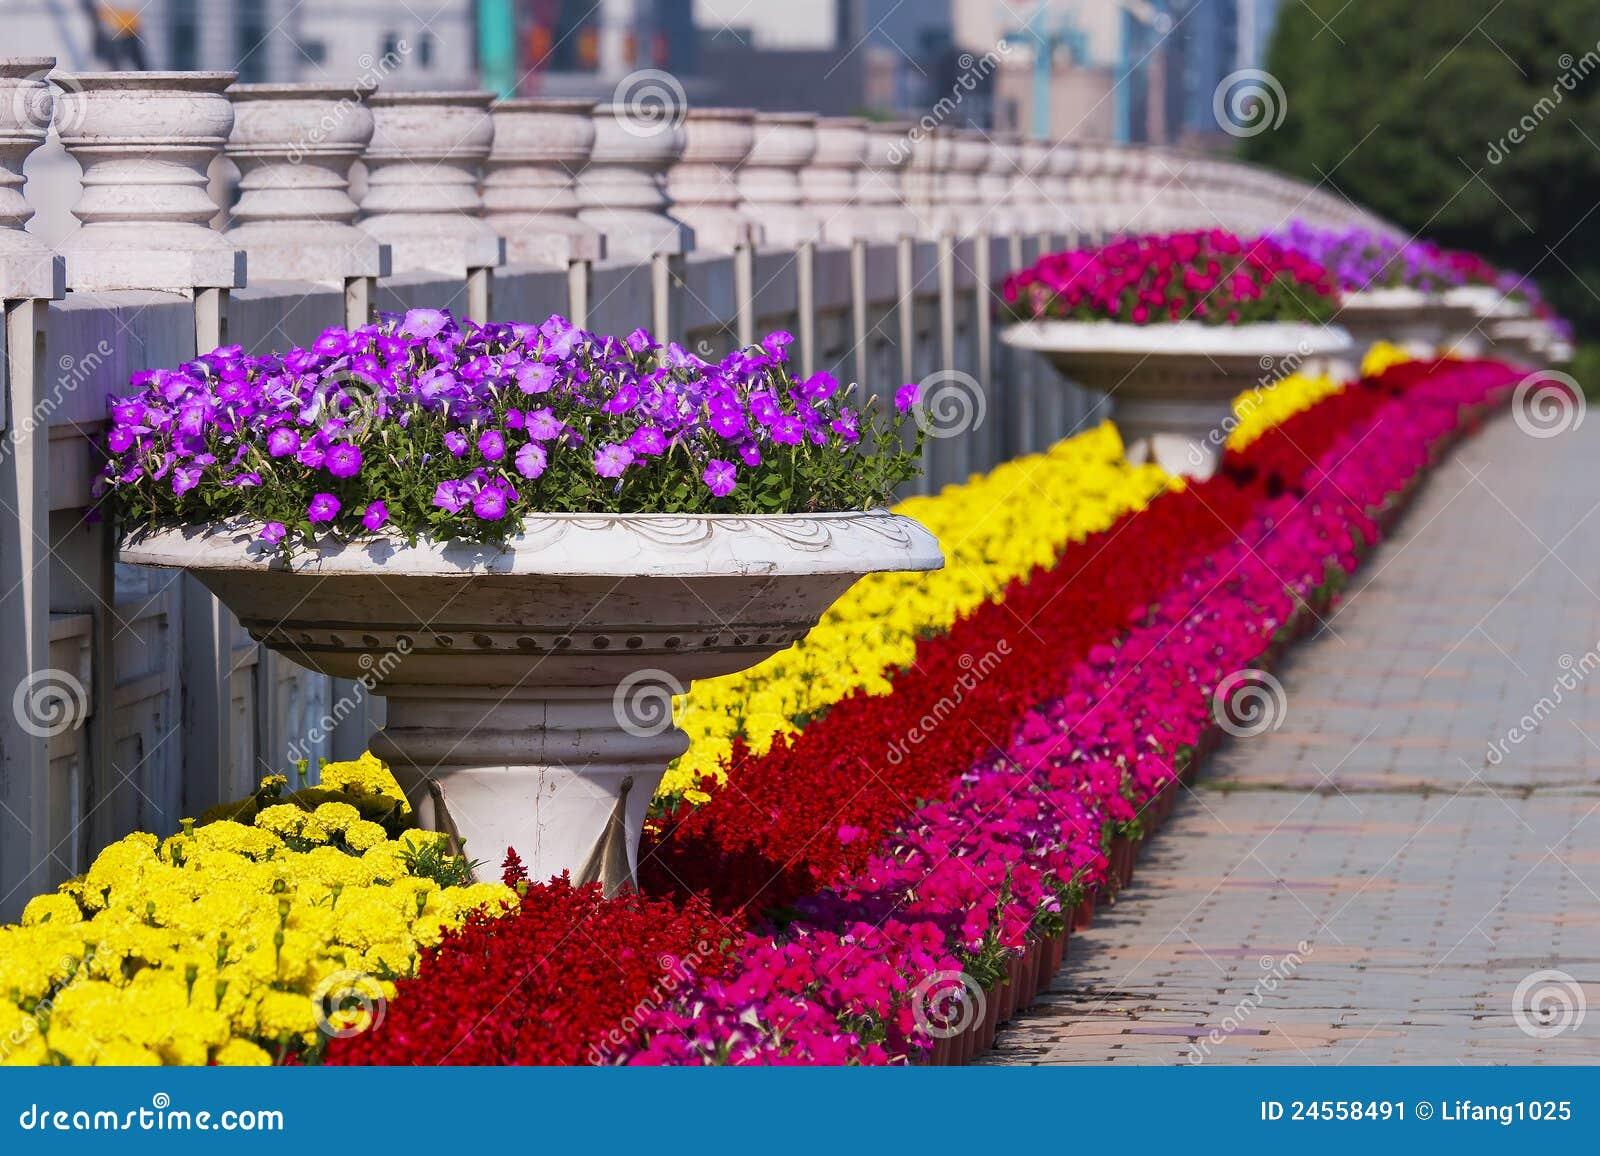 flowerbeds stock image image of chrysanthemum landscaping 24558491. Black Bedroom Furniture Sets. Home Design Ideas